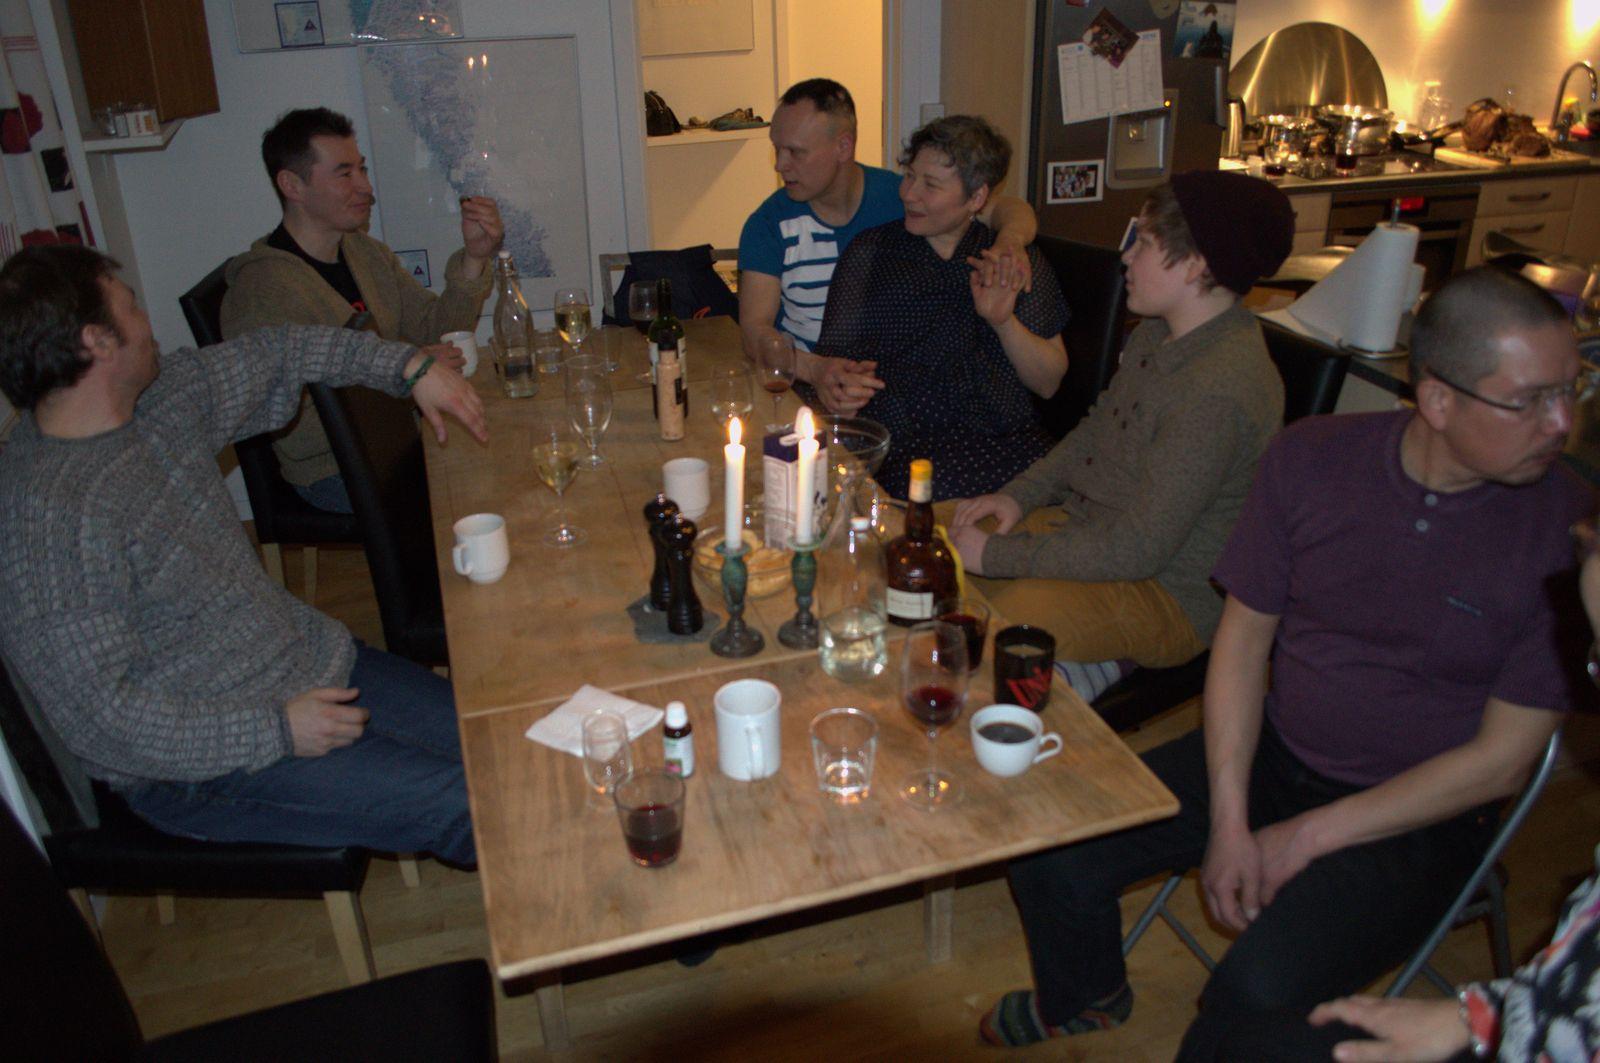 2014-04-05-2124_-_Gode_1_Jesper-Eugenius-Labansen_Mette-Labansen_Morten-Peter-Skipper-Jensen_Palle-Hjort-Sandgree